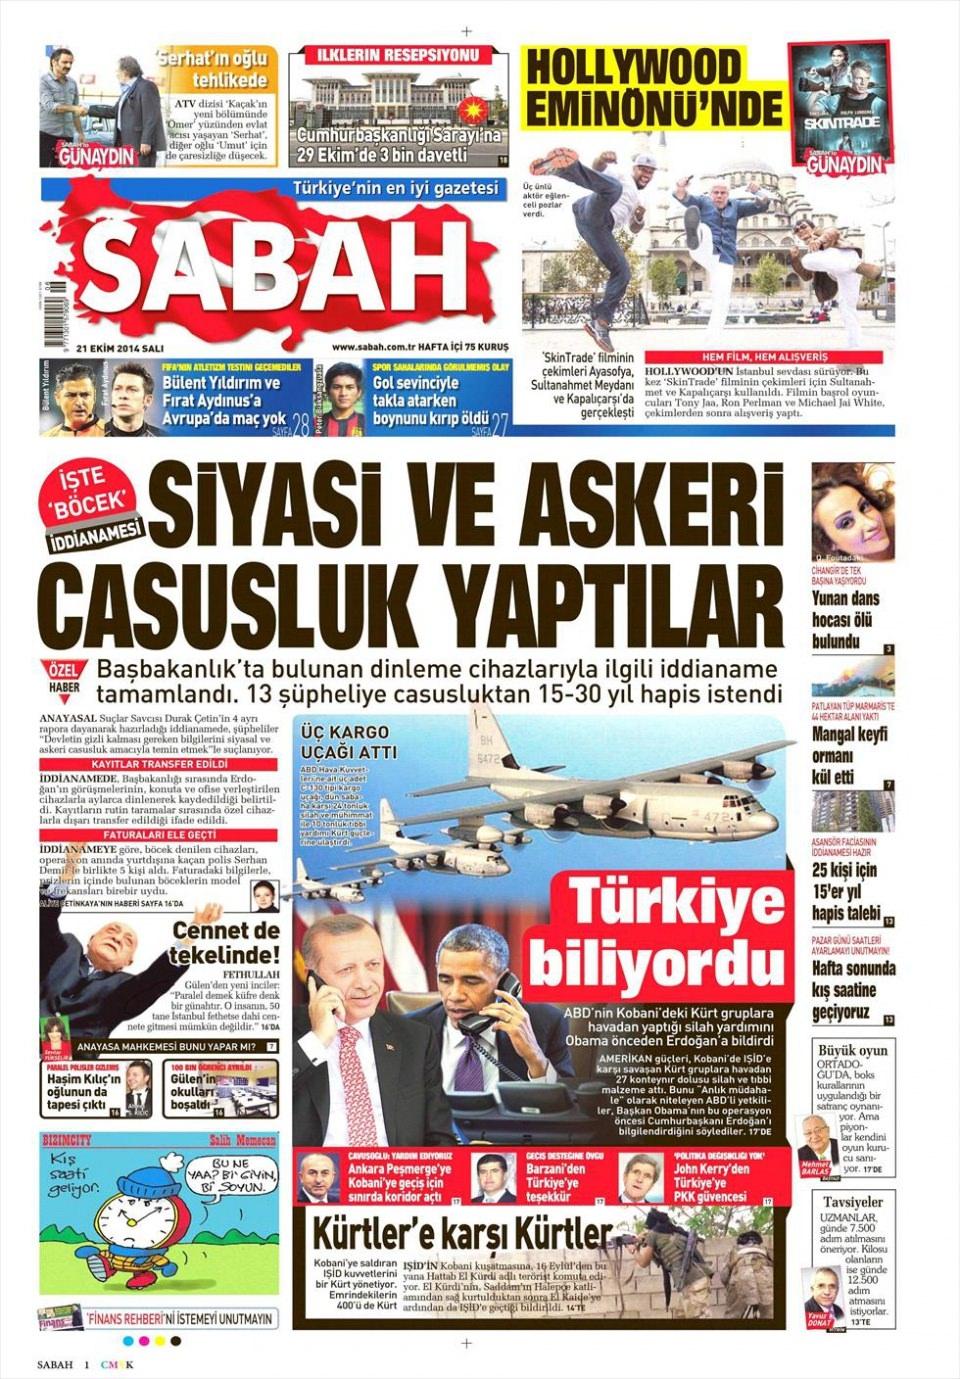 21 Ekim 2014 gazete manşetleri 14